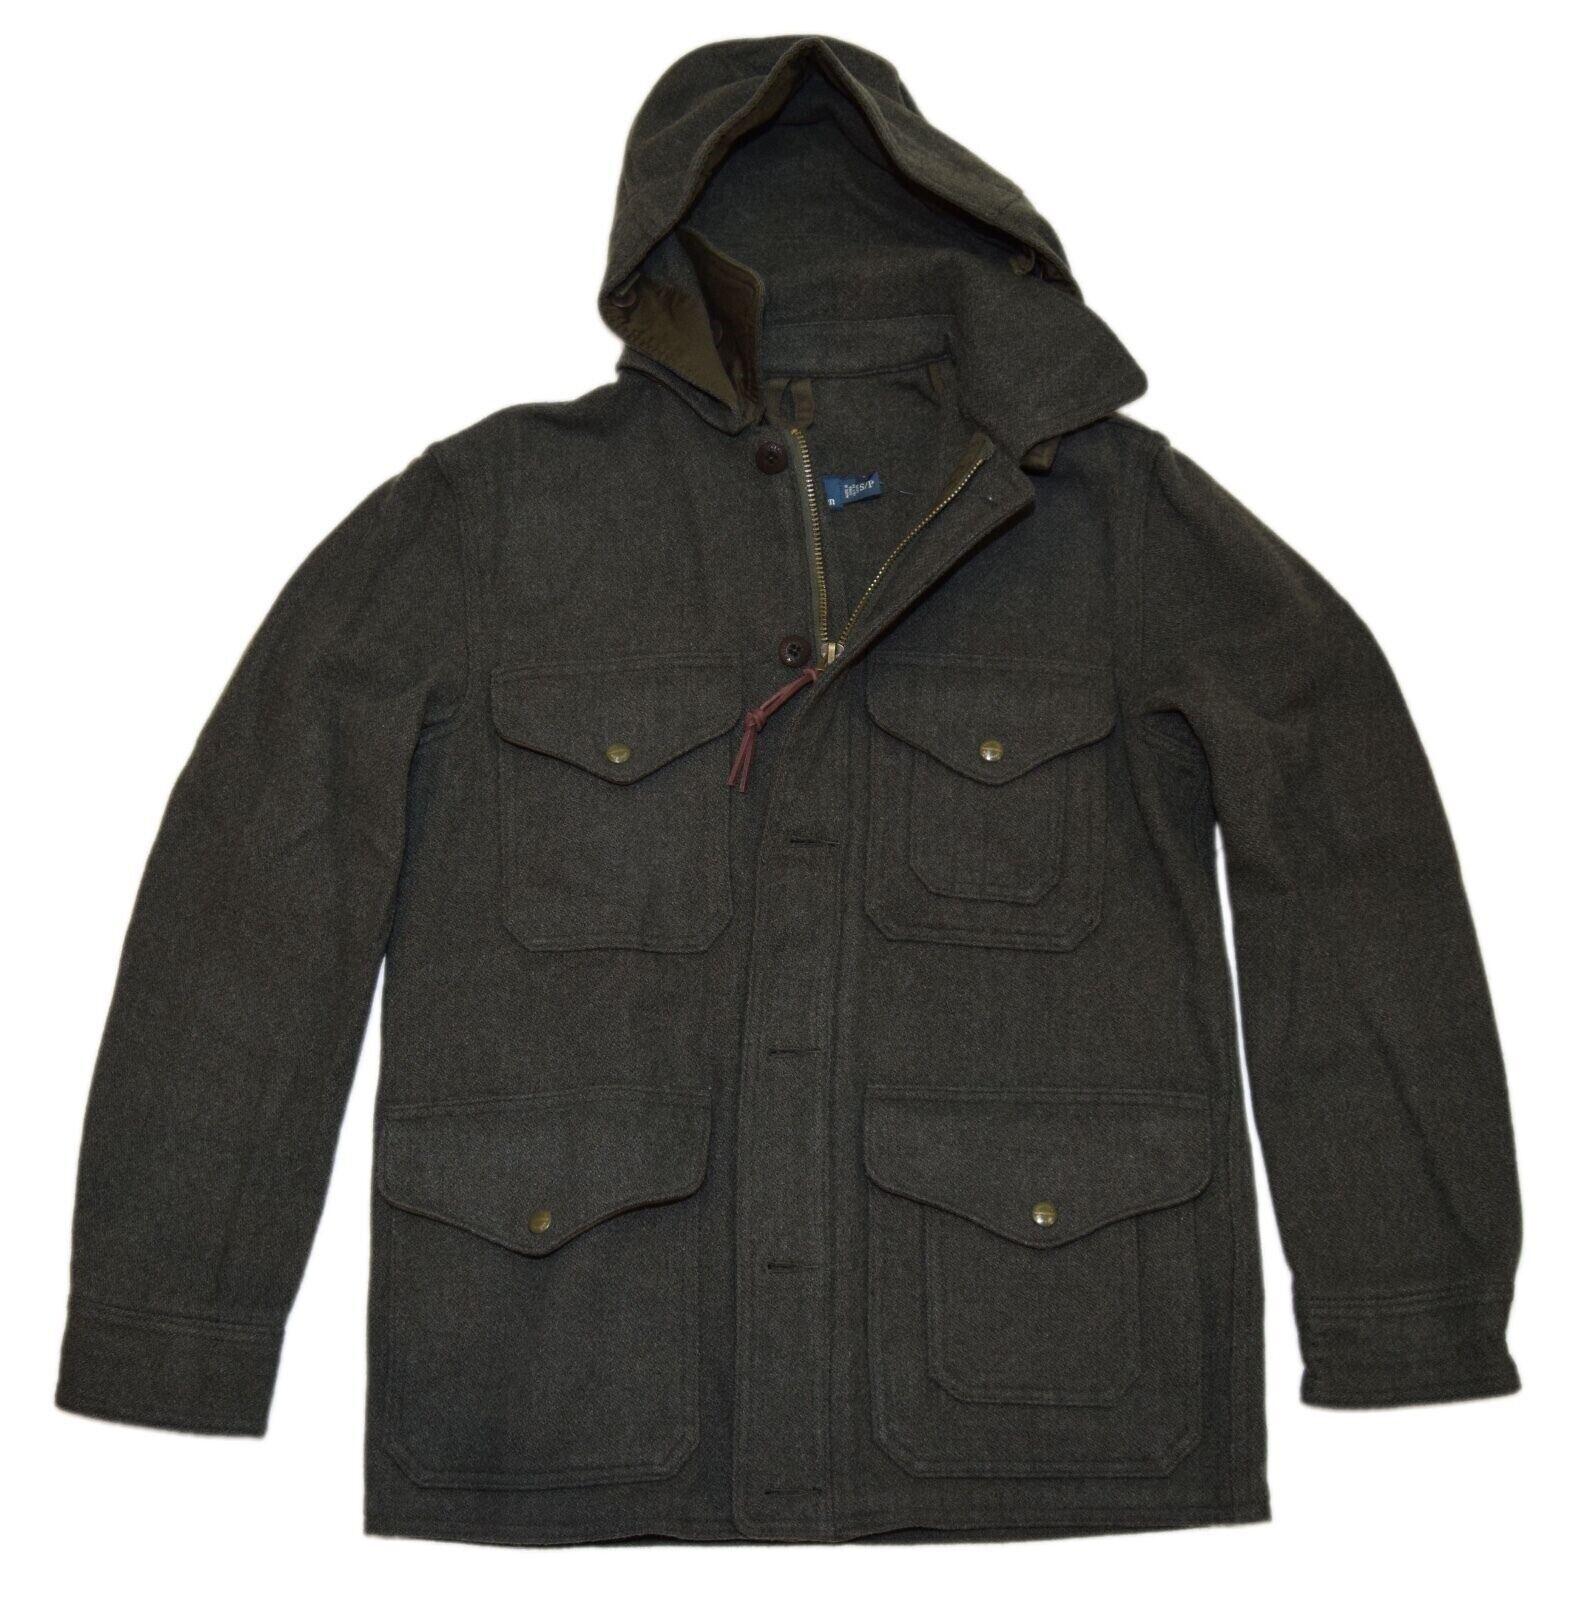 495-polo-ralph-lauren-mens-hooded-parka-cargo-coat-jacket-wool-olive-green-xxl